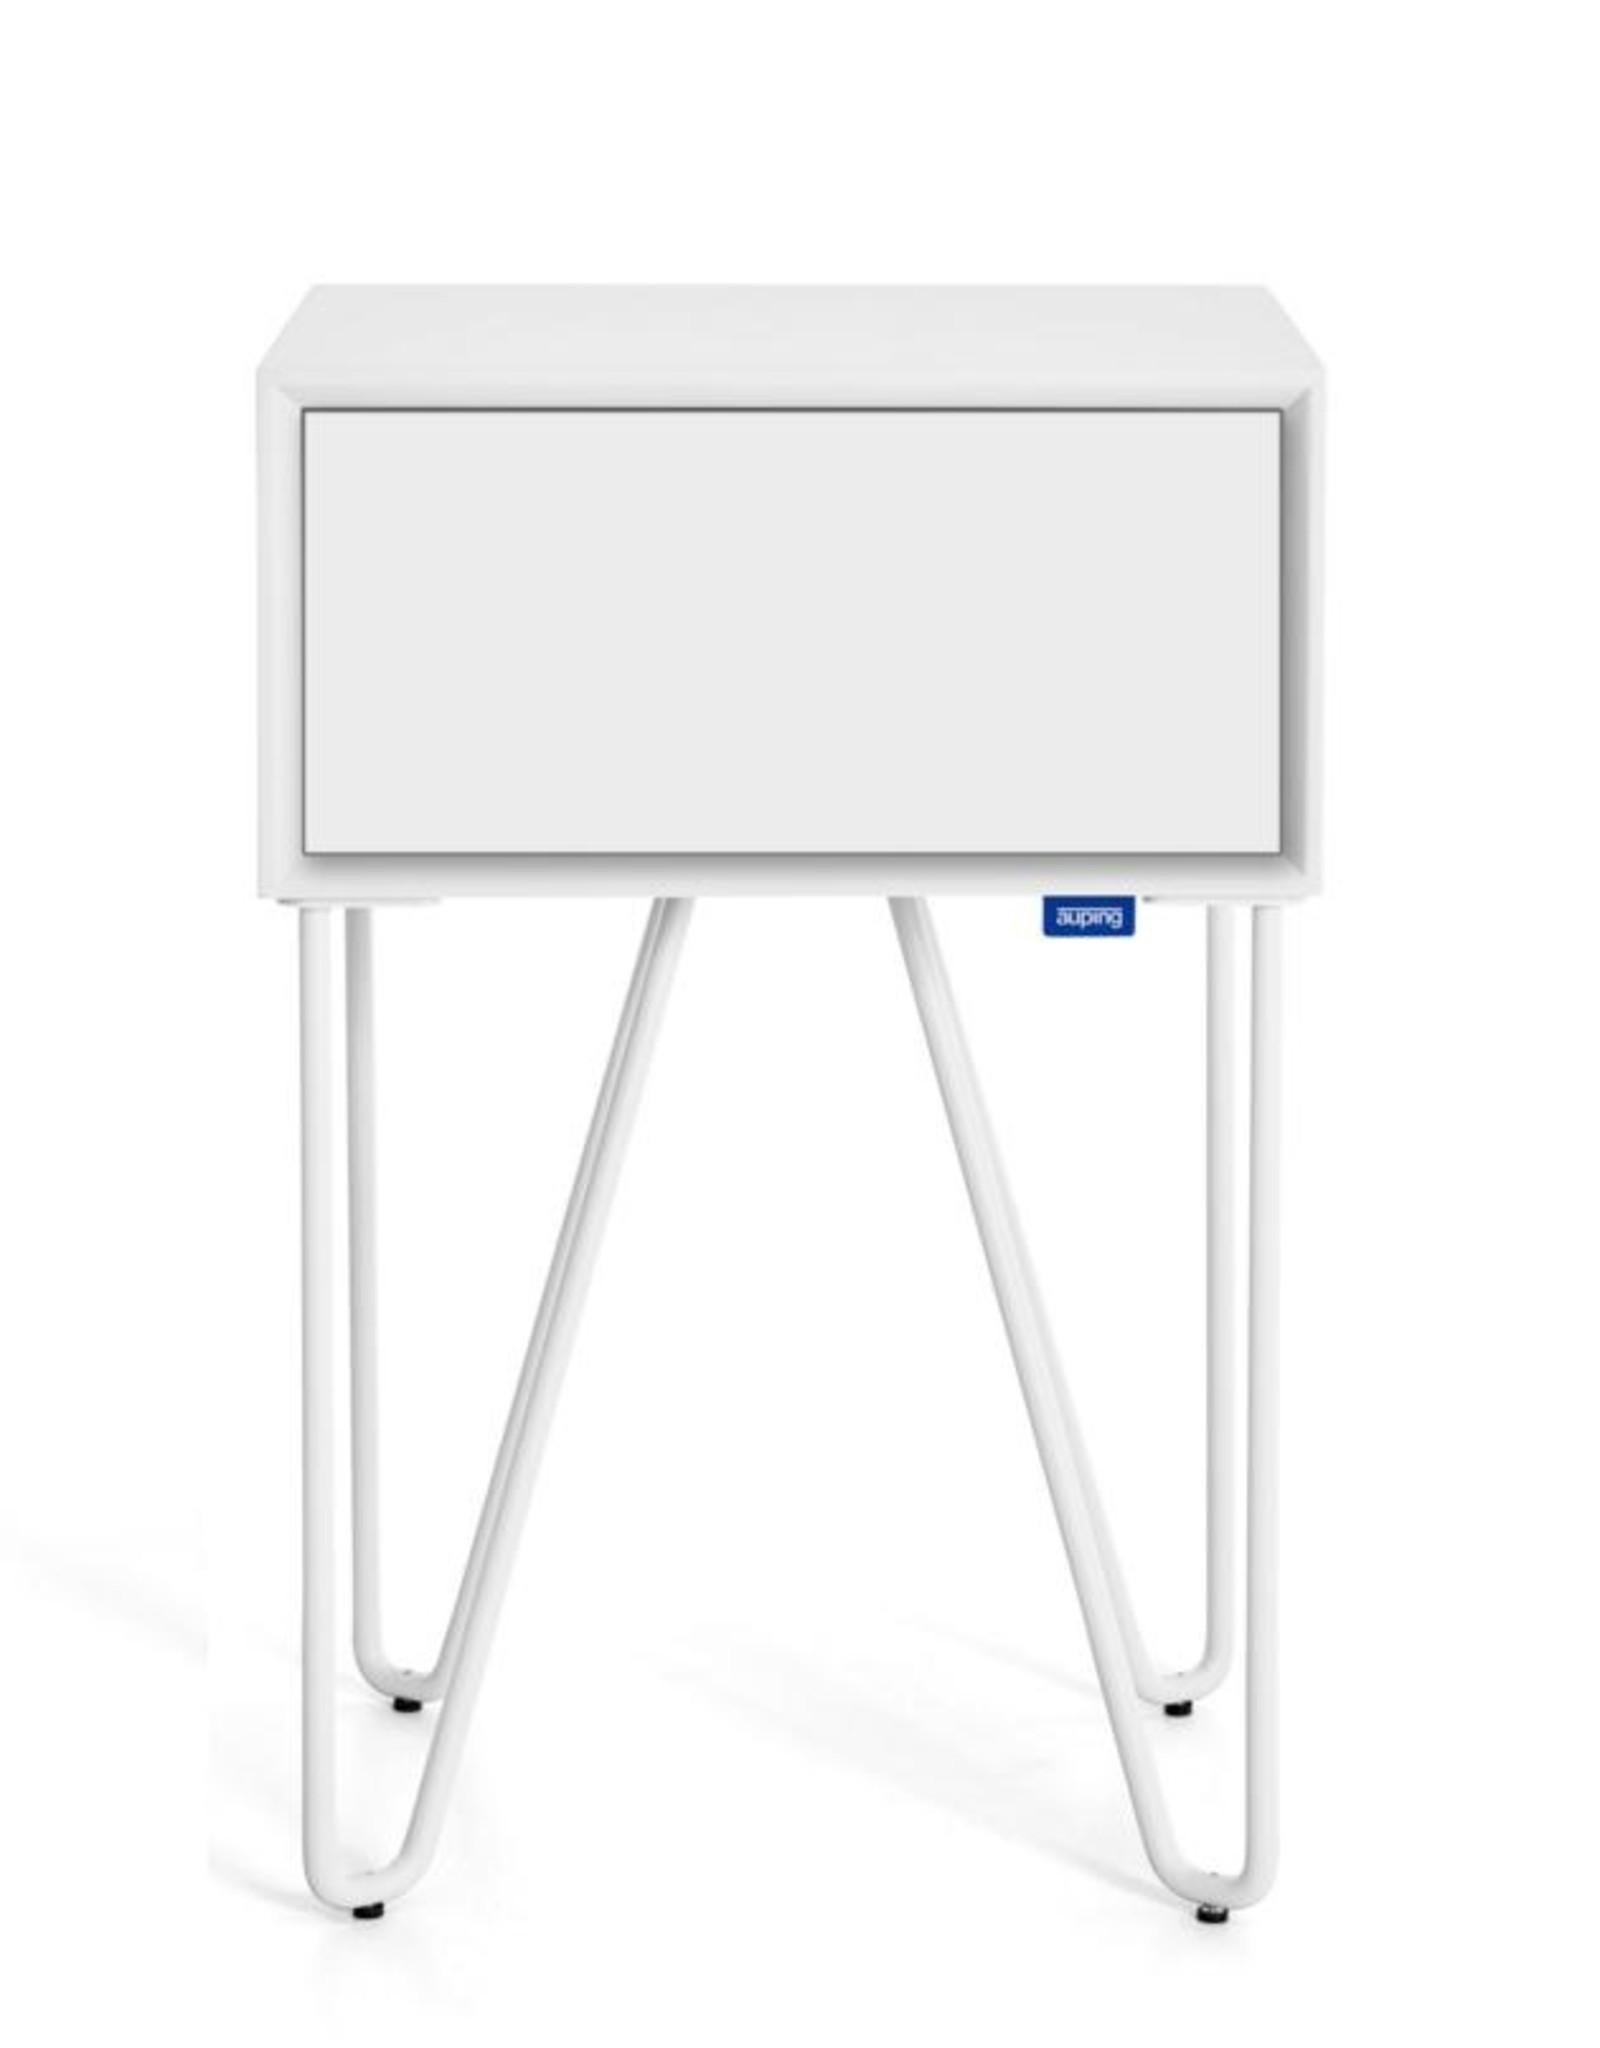 Auping Nachttafel Pixel - 02 Pure White